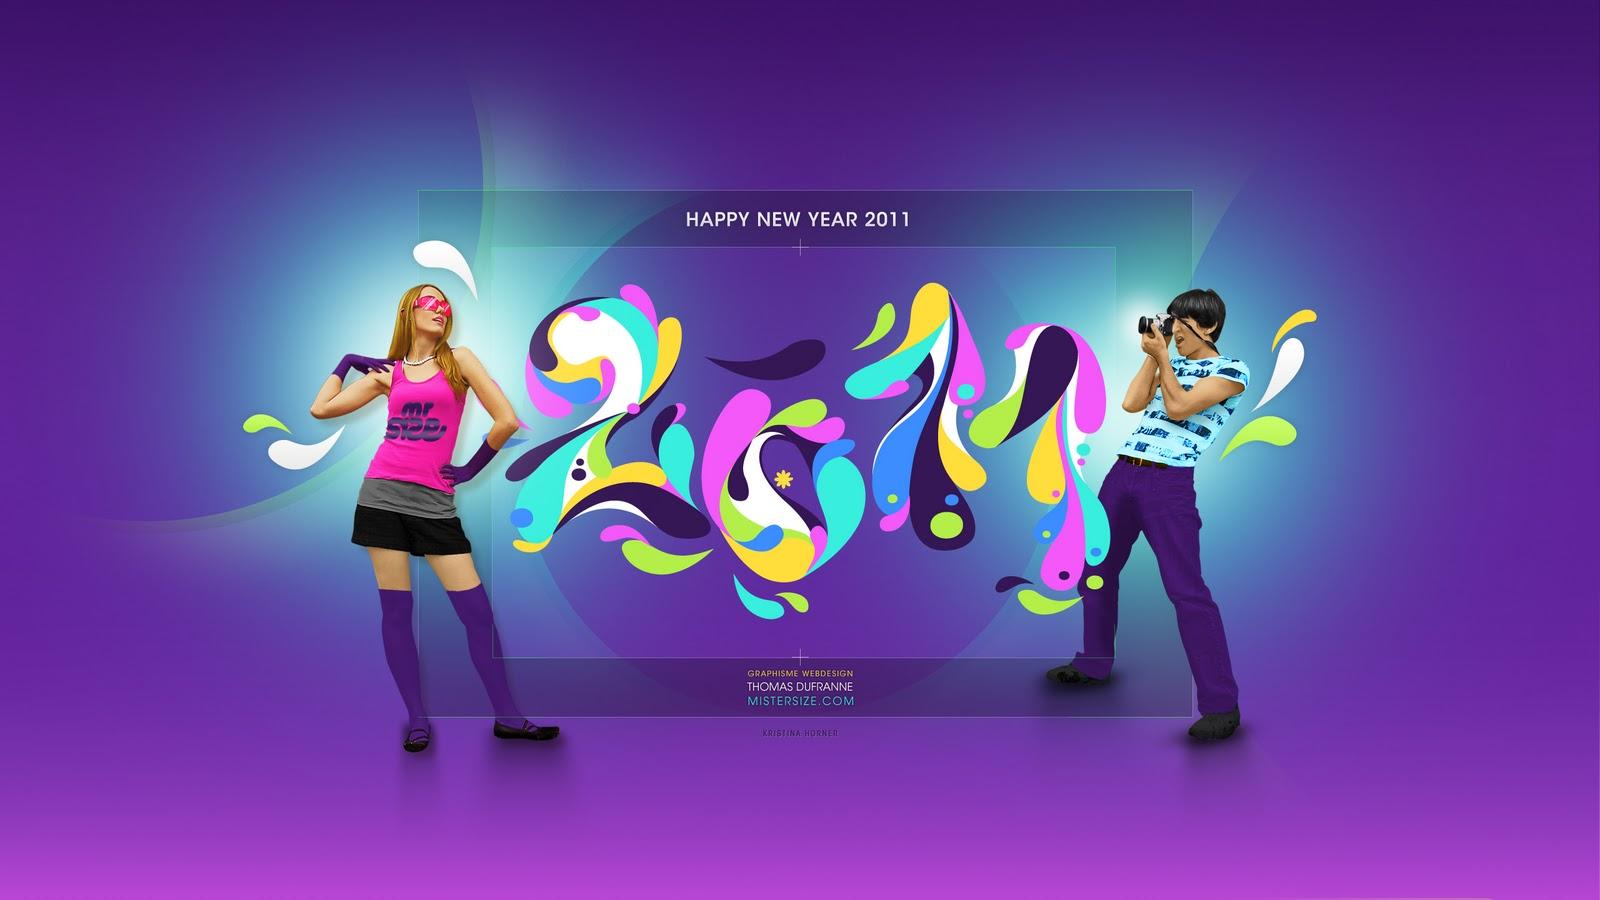 http://1.bp.blogspot.com/_Ain1HbvlMRk/TRT3ND1bv9I/AAAAAAAAHgk/jUD-bOlAOts/s1600/wallpaper-2011-imac-27.jpg